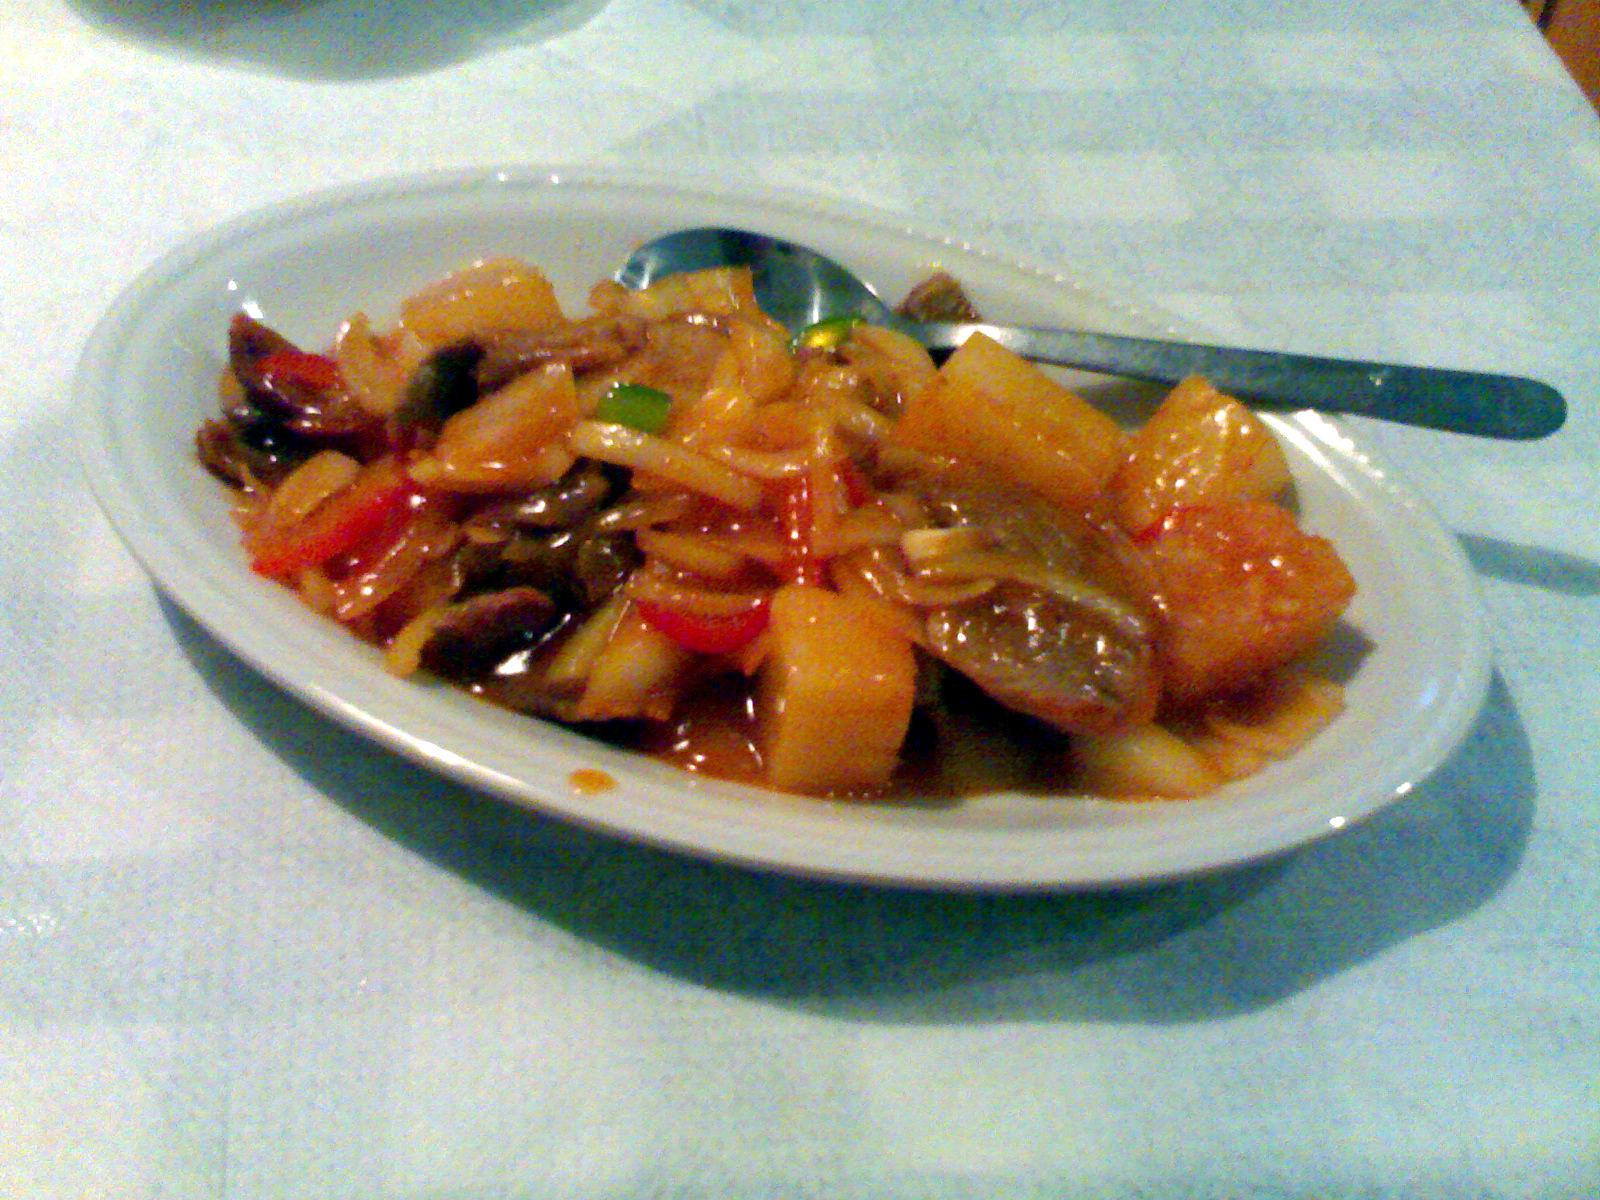 Xin Yuan, Helsingfors: Ankkaa ananaksella